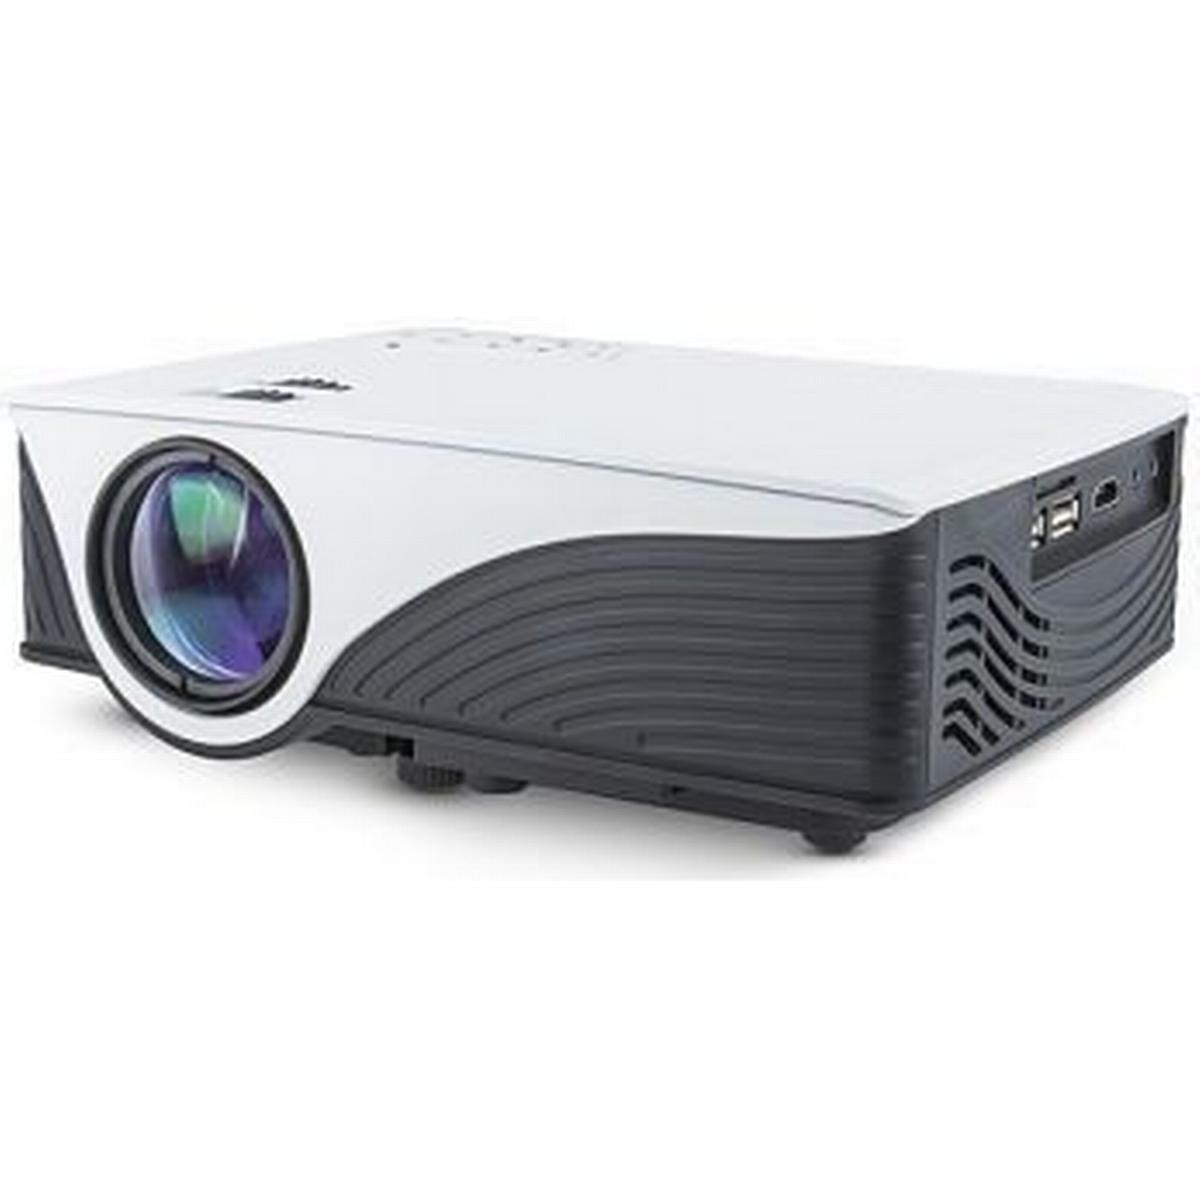 Tidssvarende LED Projektor - Jämför priser på LED Projektorer PriceRunner PK-34